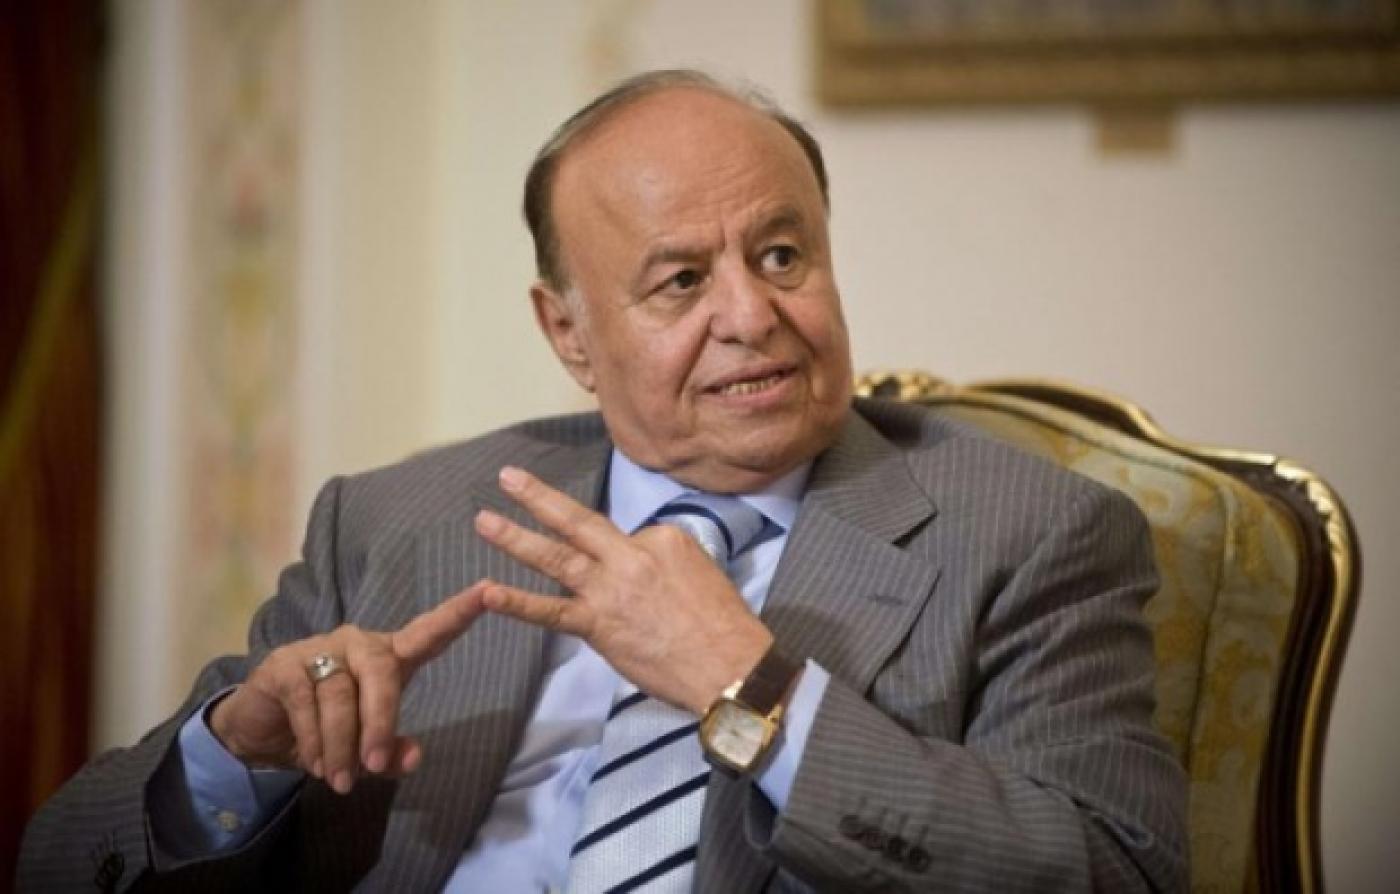 Yemen's President Abd Rabbu Mansur Hadi